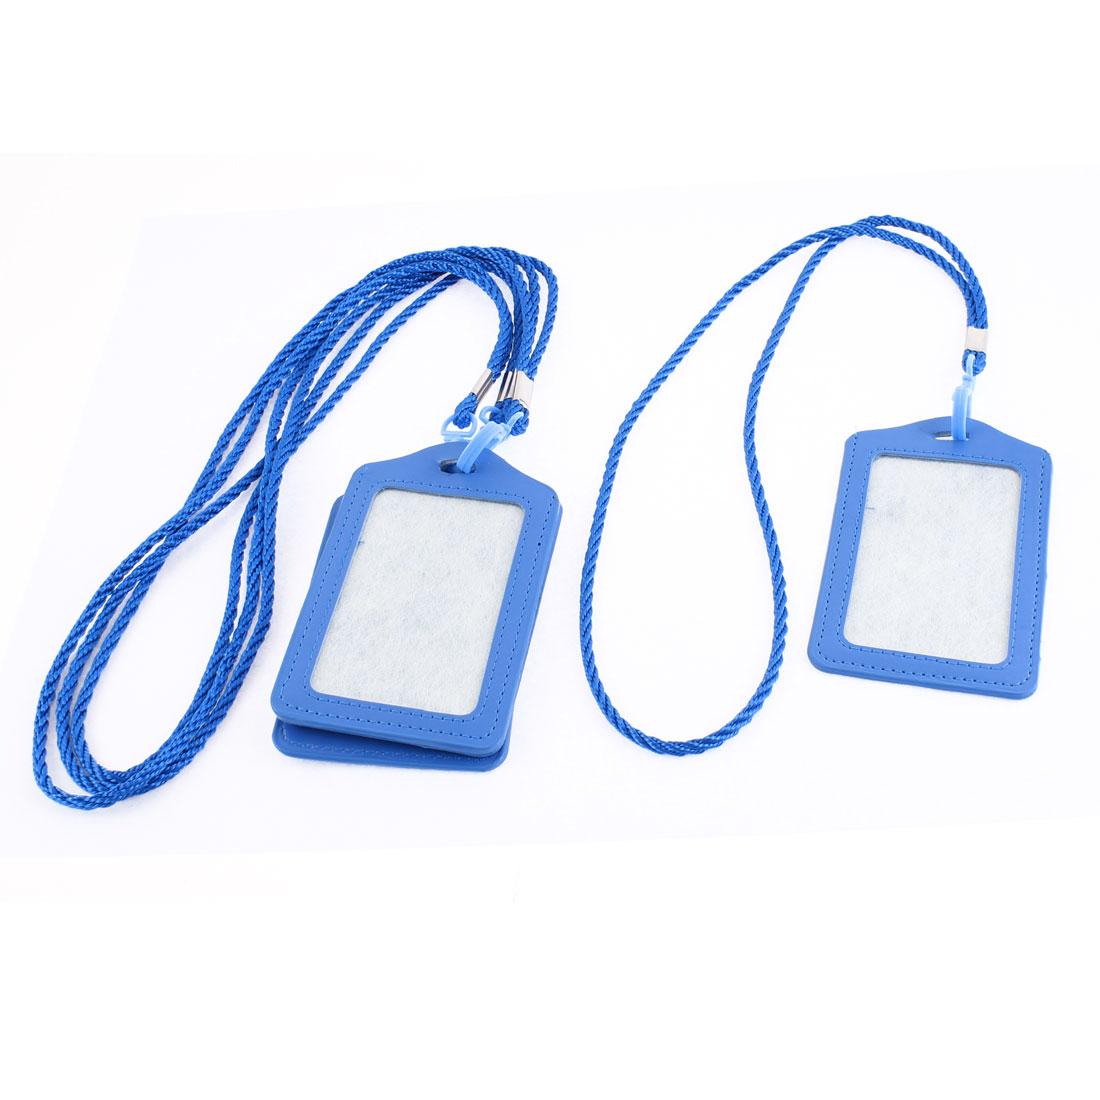 Faux Leather Vertical Design Office Business Badge Credit Card Holder Blue 4pcs